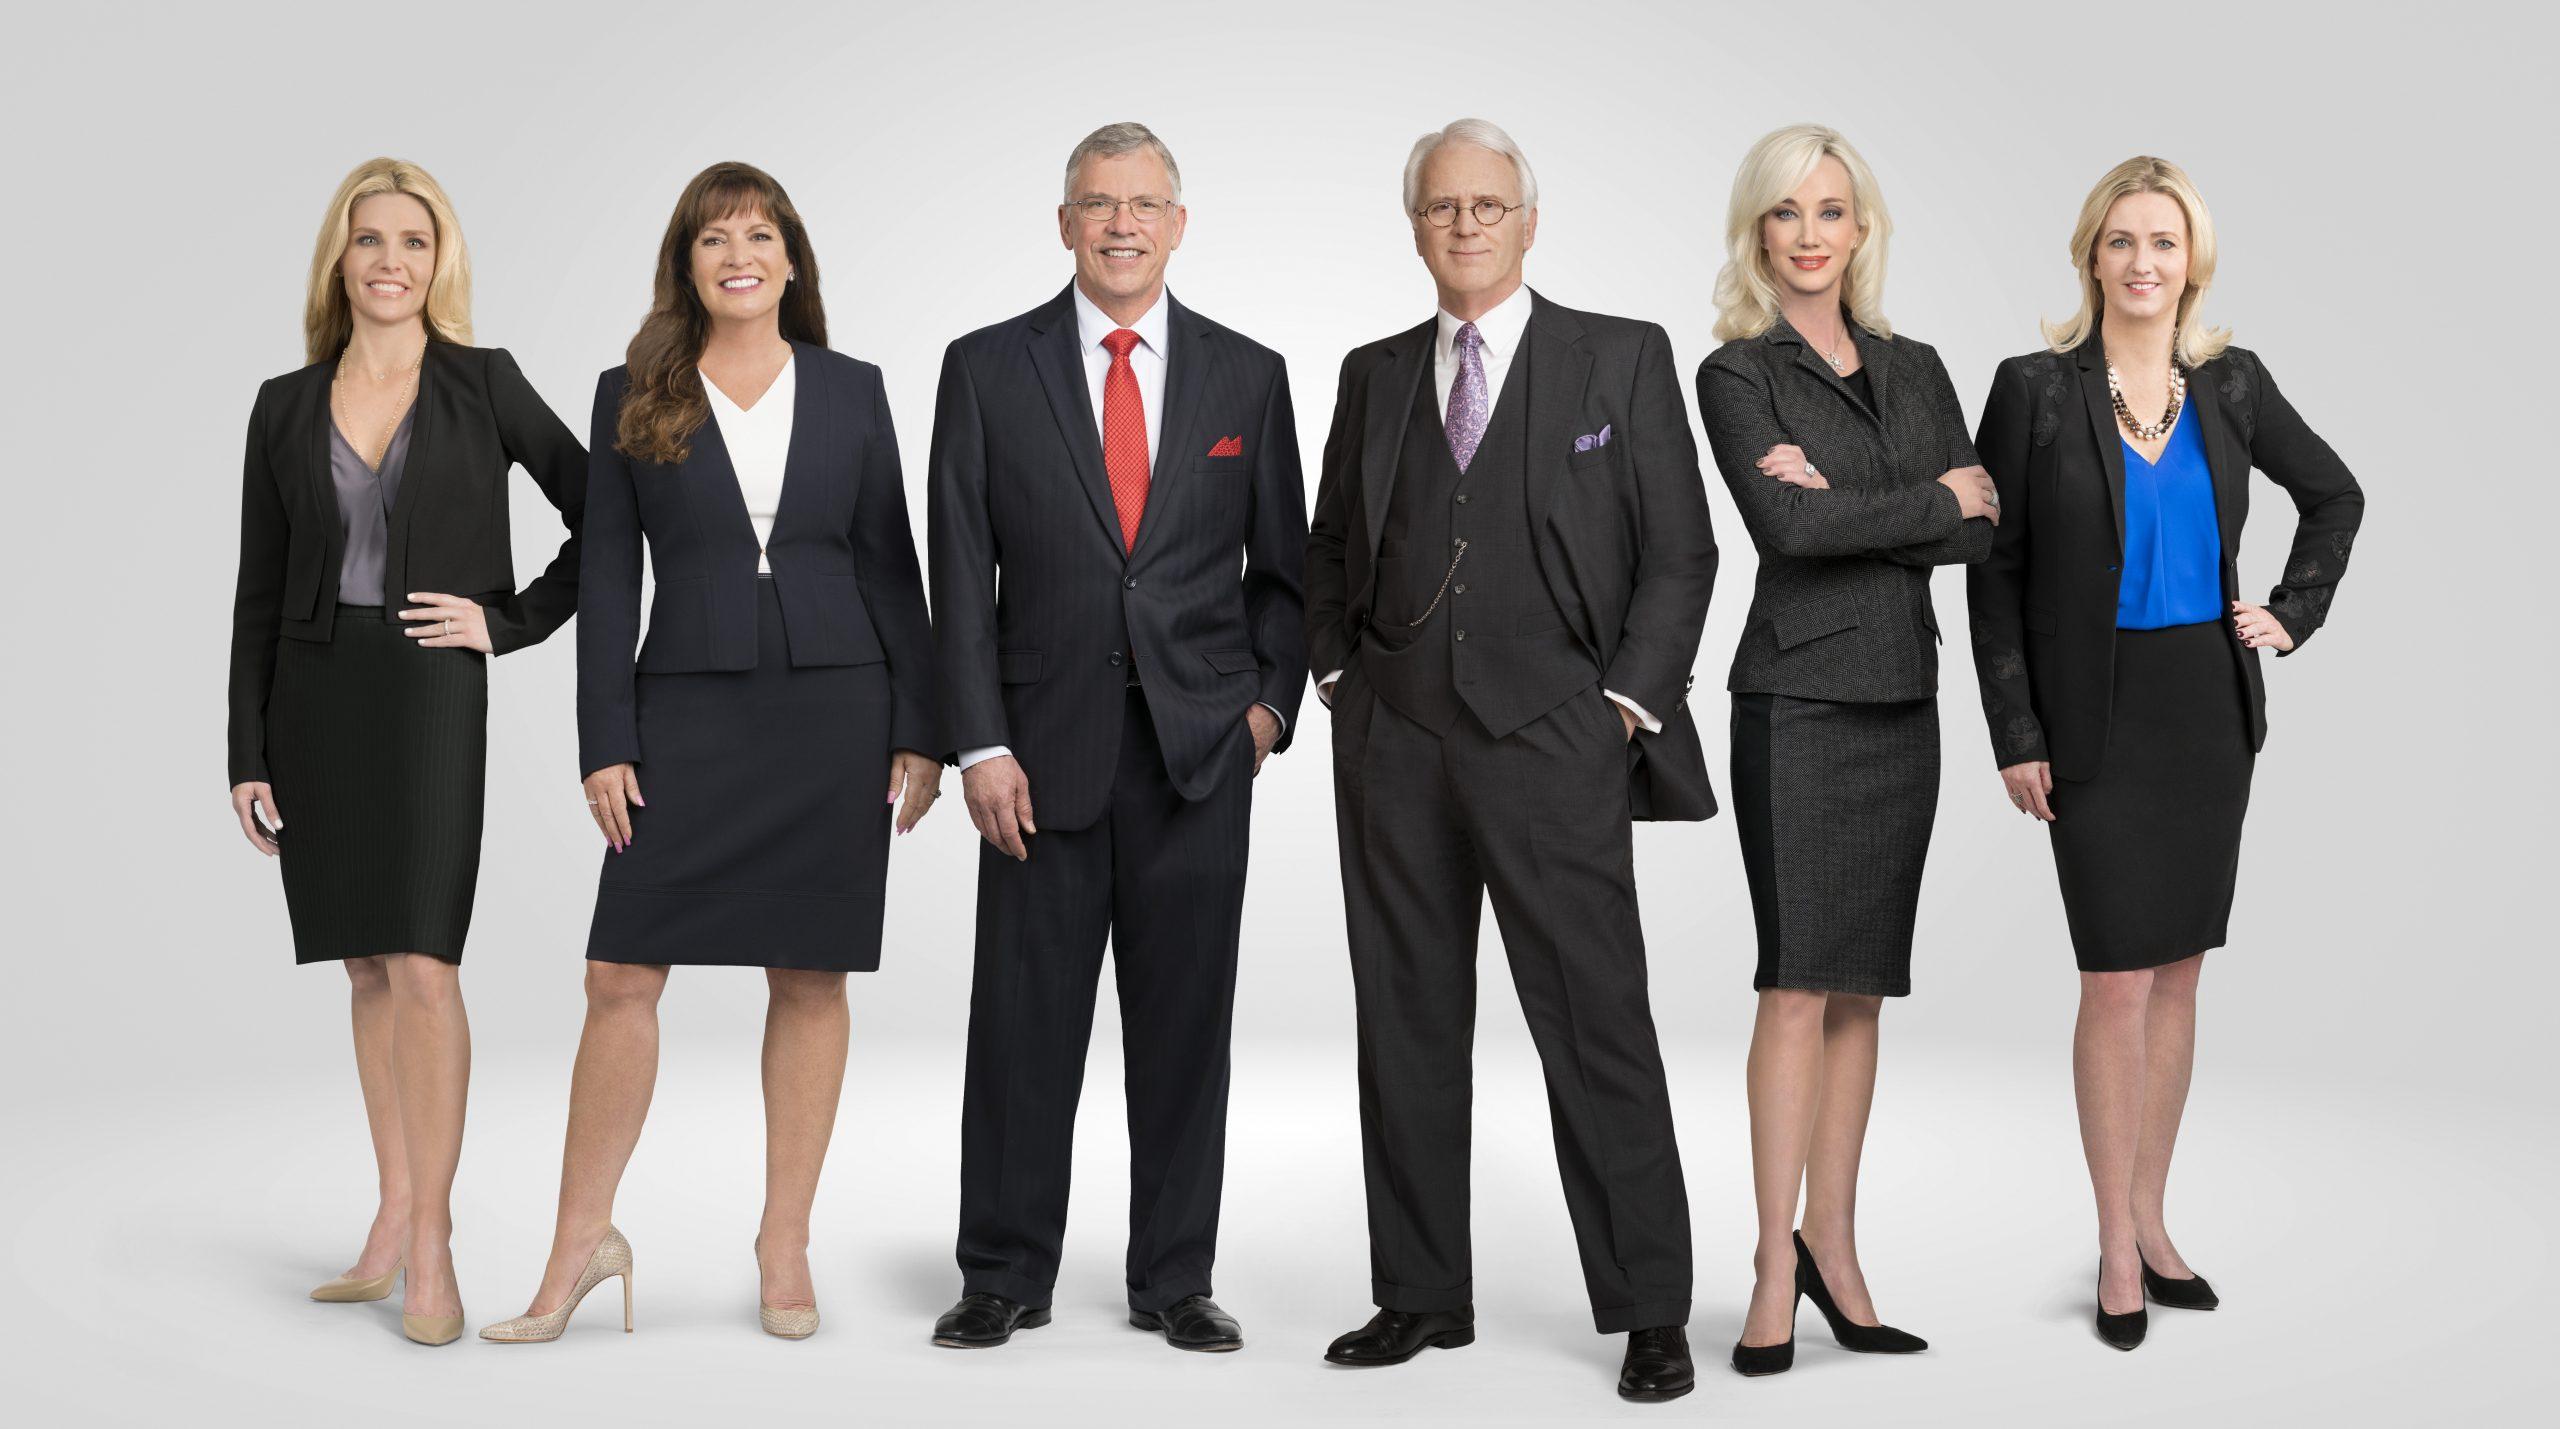 KoonsFuller, P.C. Family Law Six Managing Shareholders Heather King Rick Robertson Ike Vanden Eykel Charla Bradshaw Sherri Evans Liz Porter